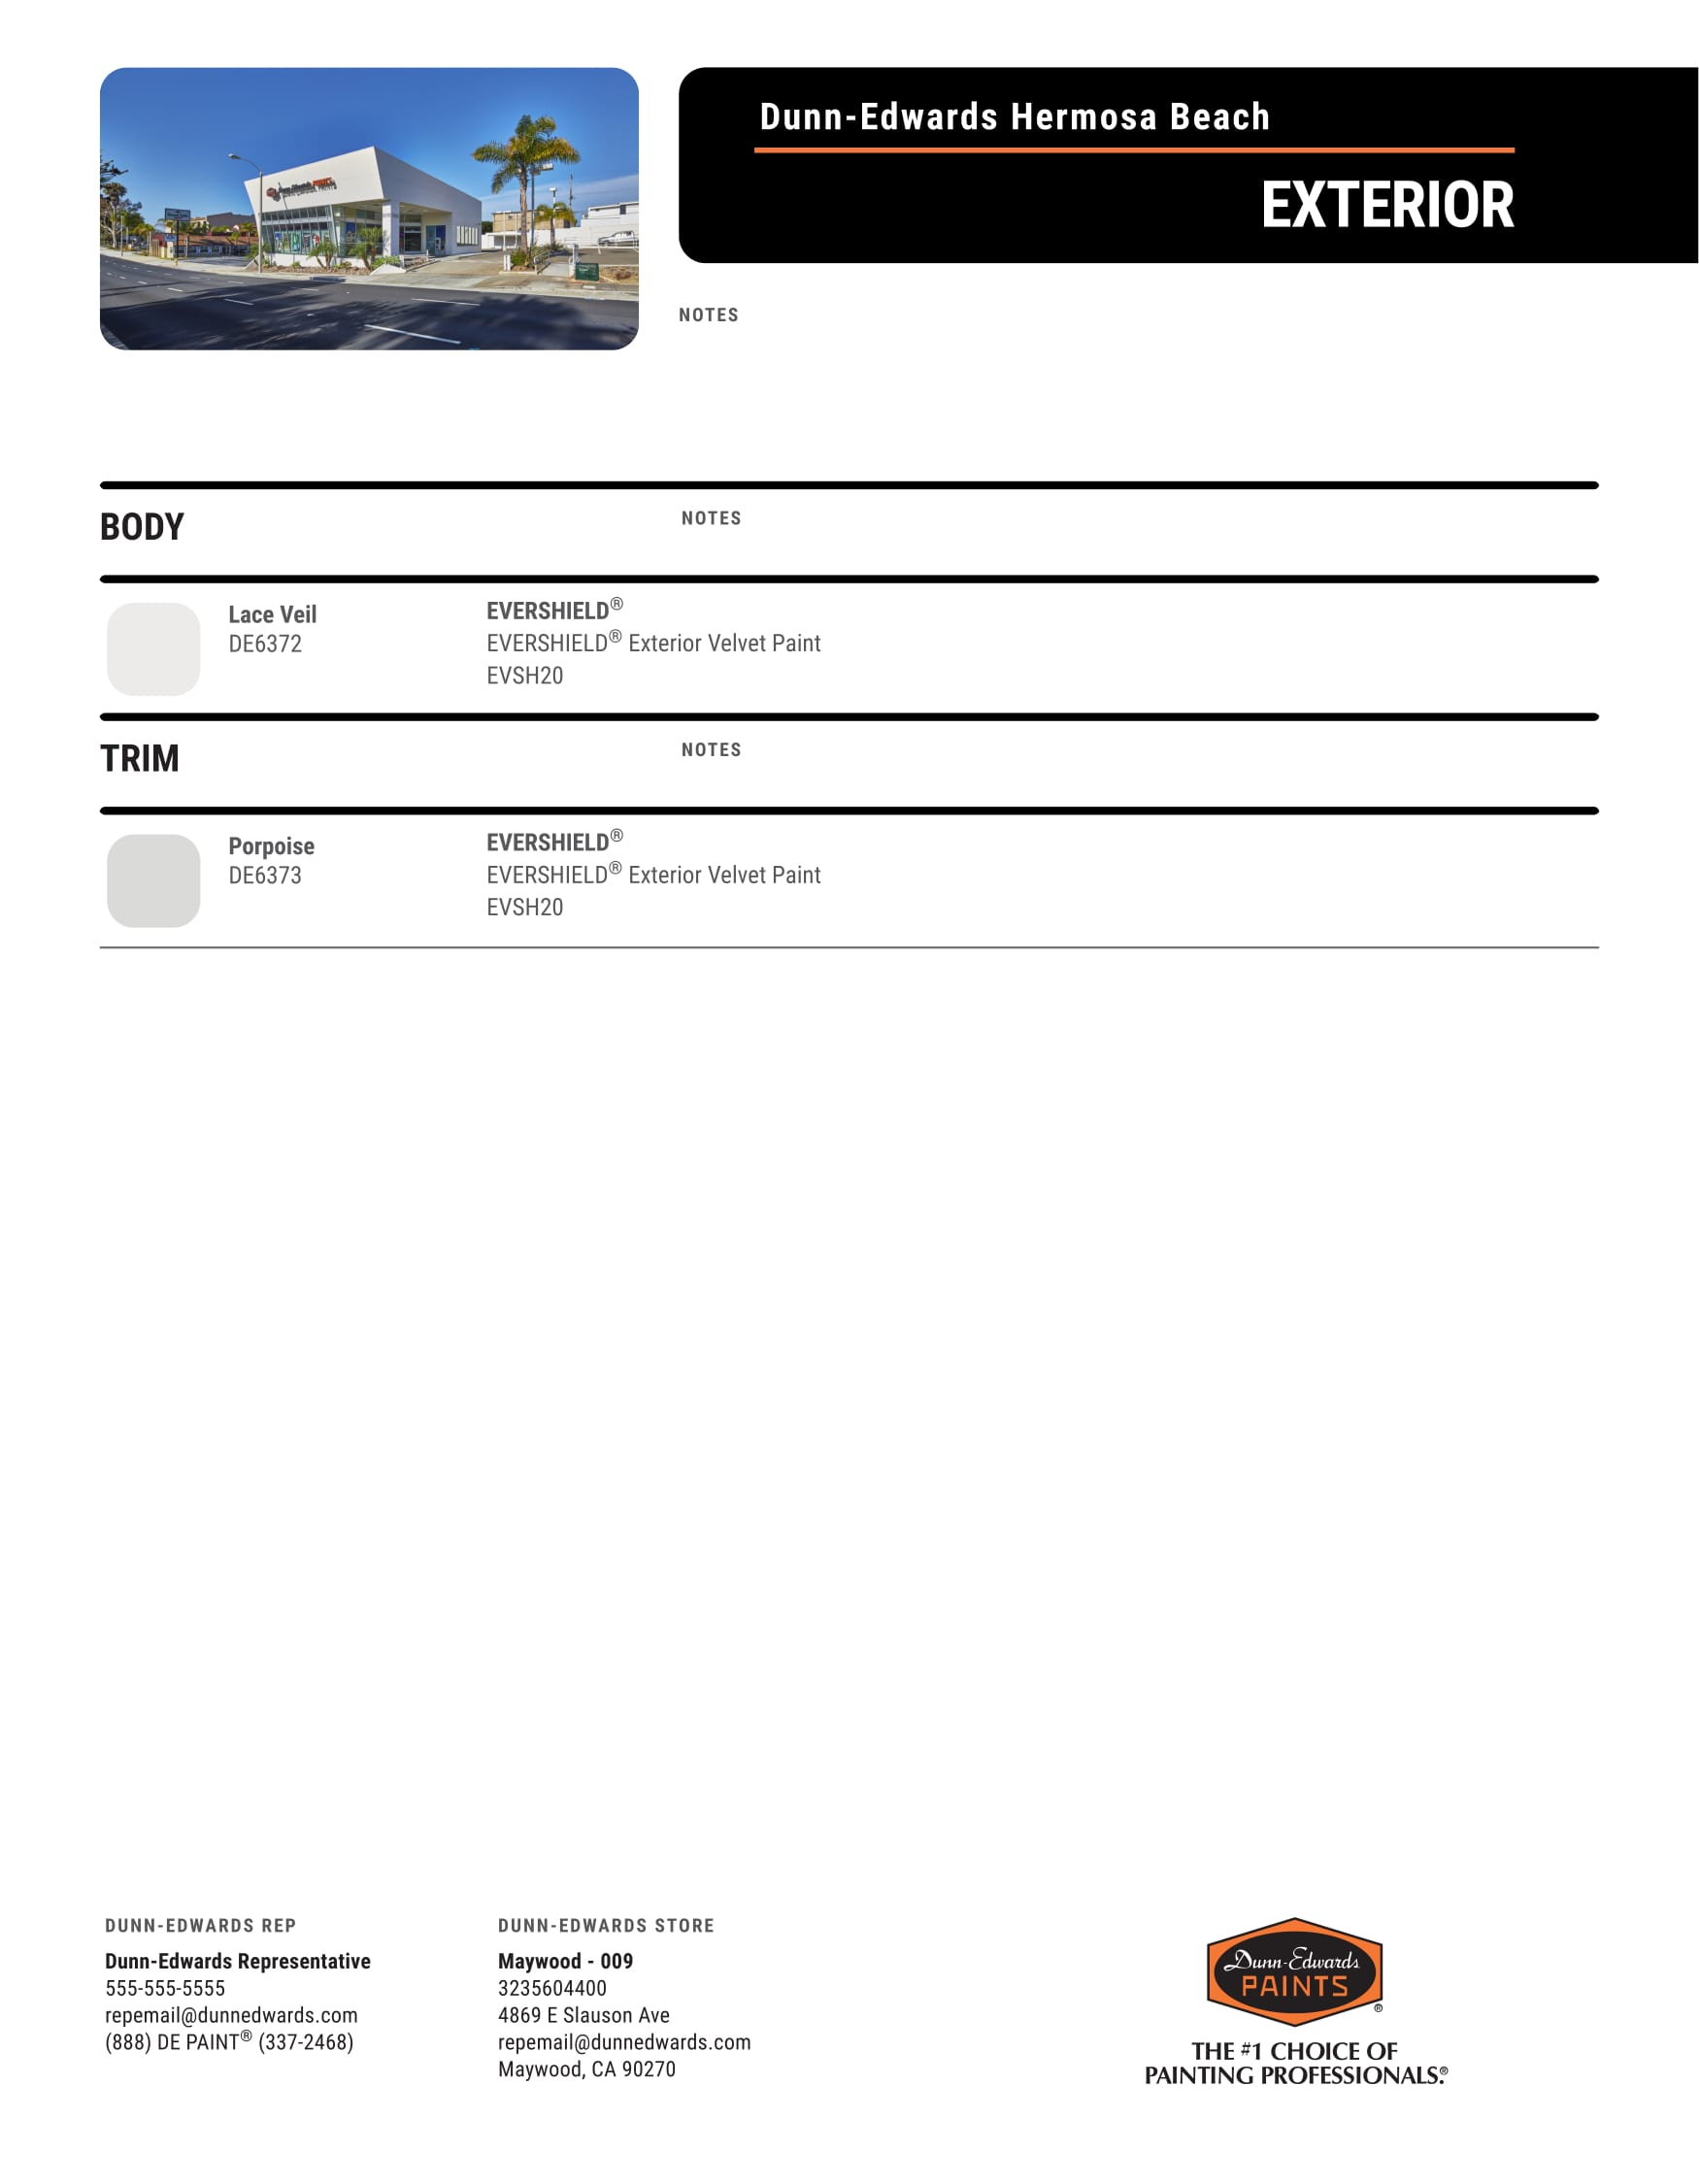 job-record-Dunn-Edwards_Hermosa_Beach-02.jpg